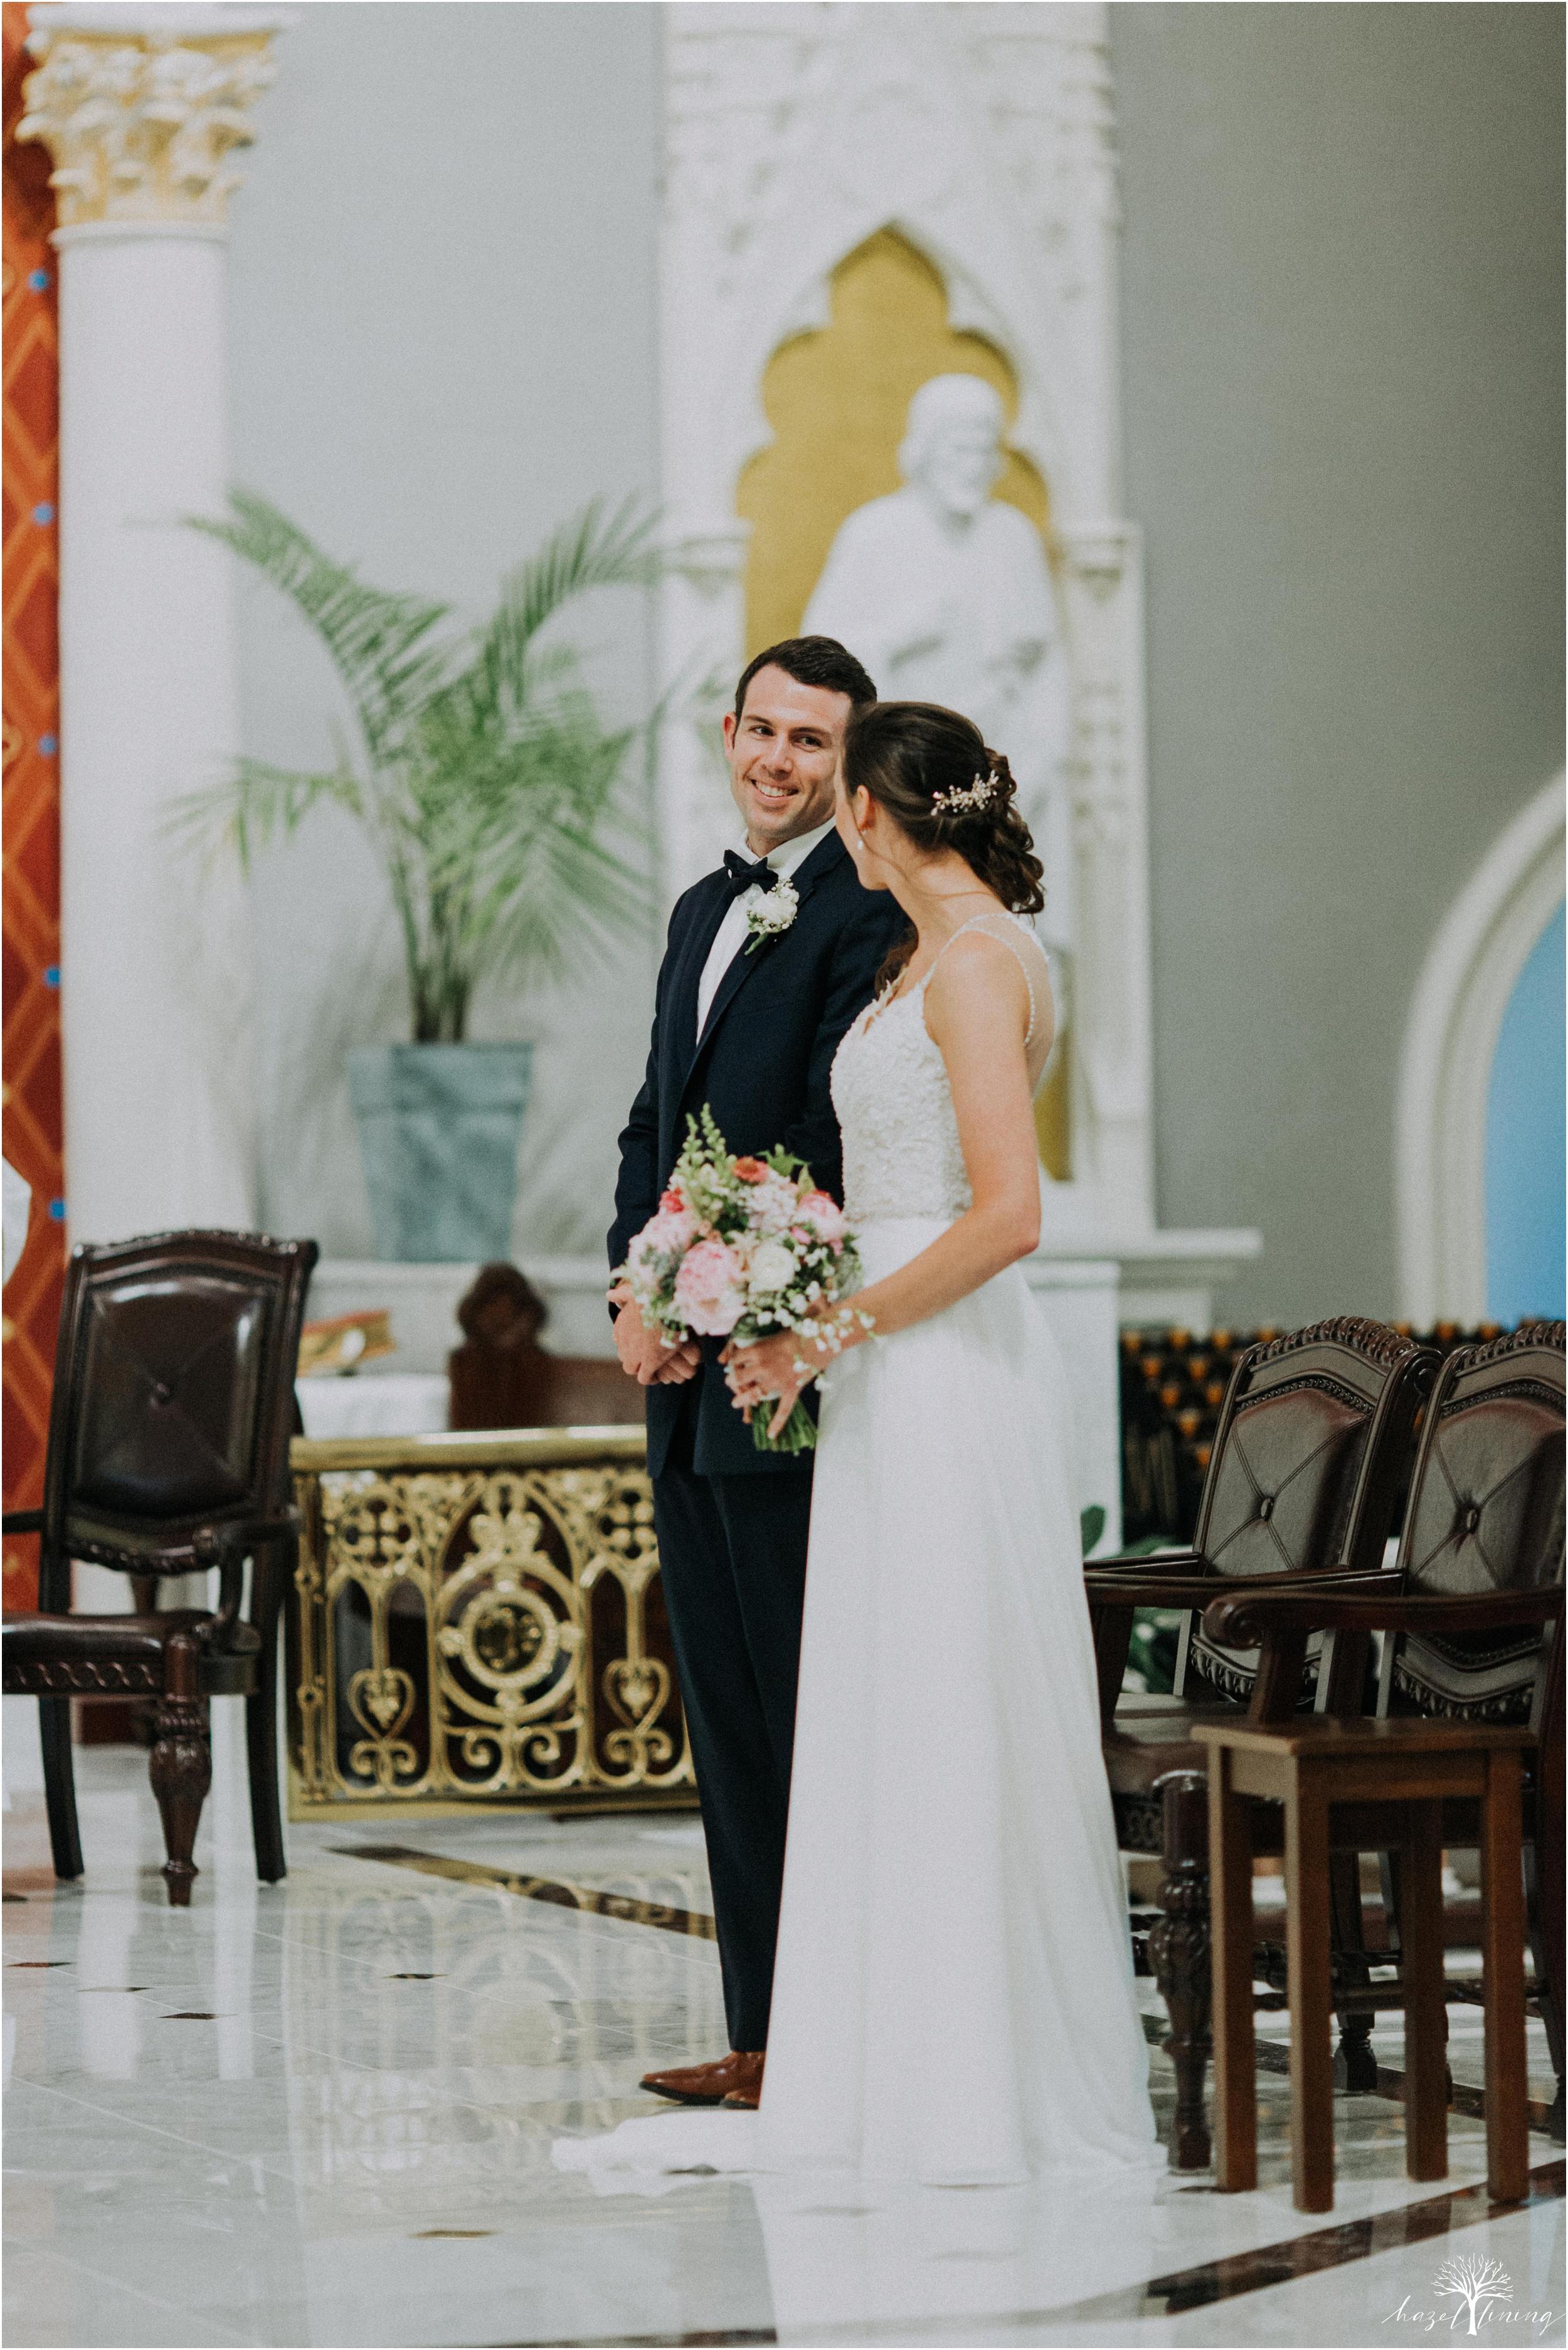 hazel-lining-travel-wedding-elopement-photography_0052.jpg